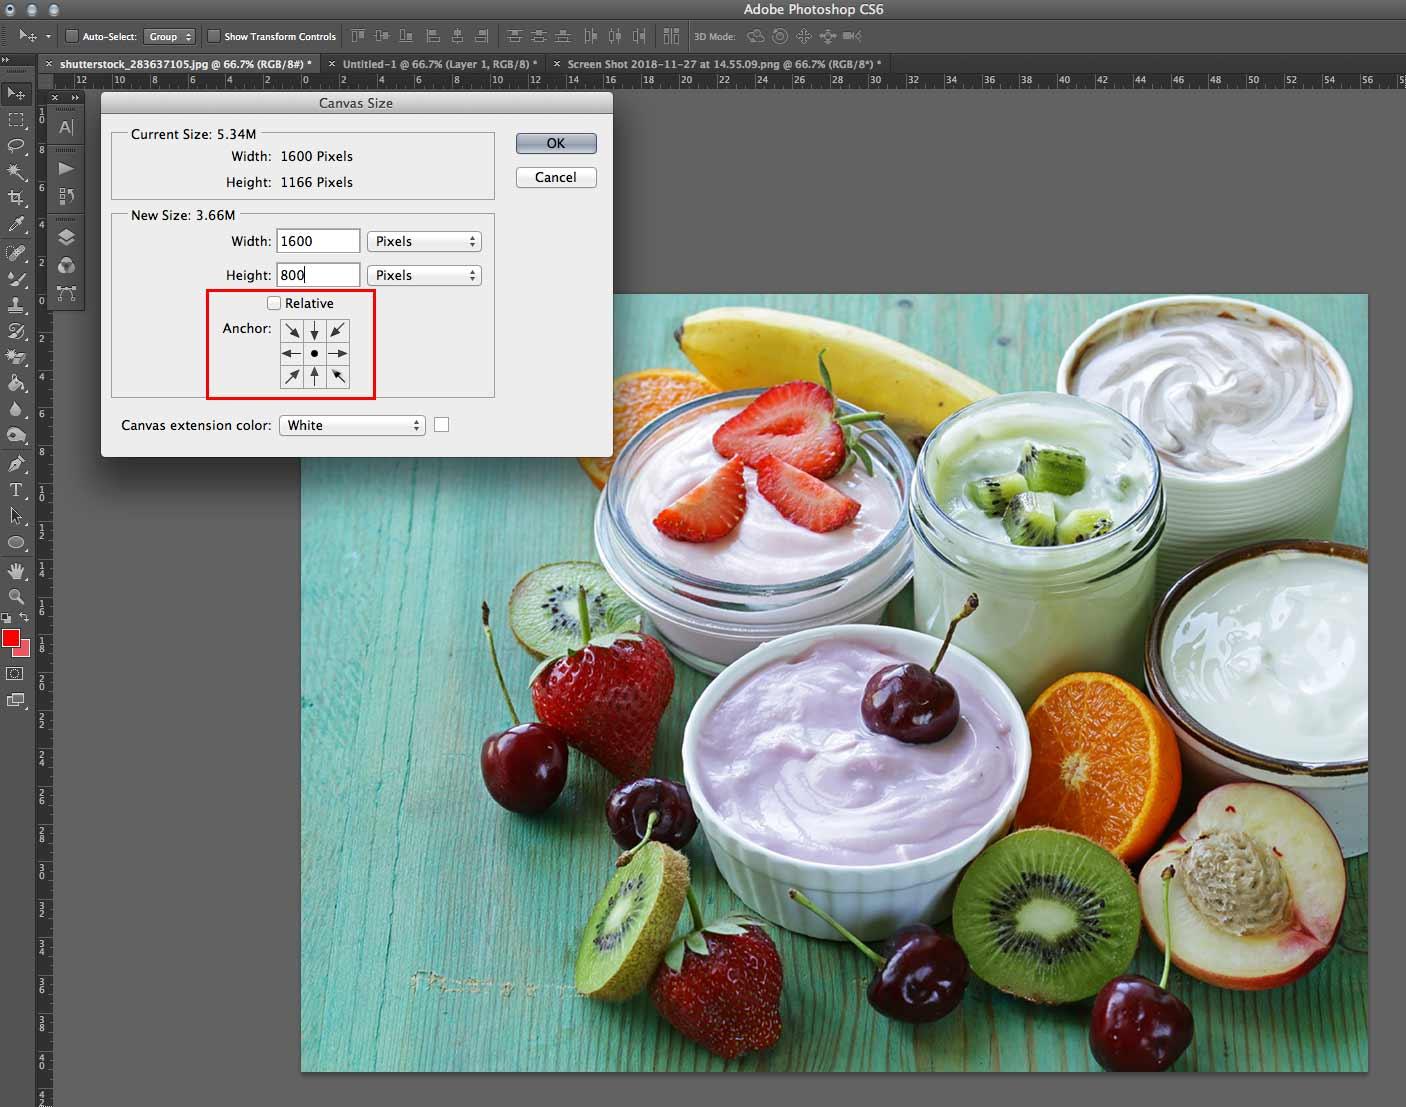 optimise images canvas size